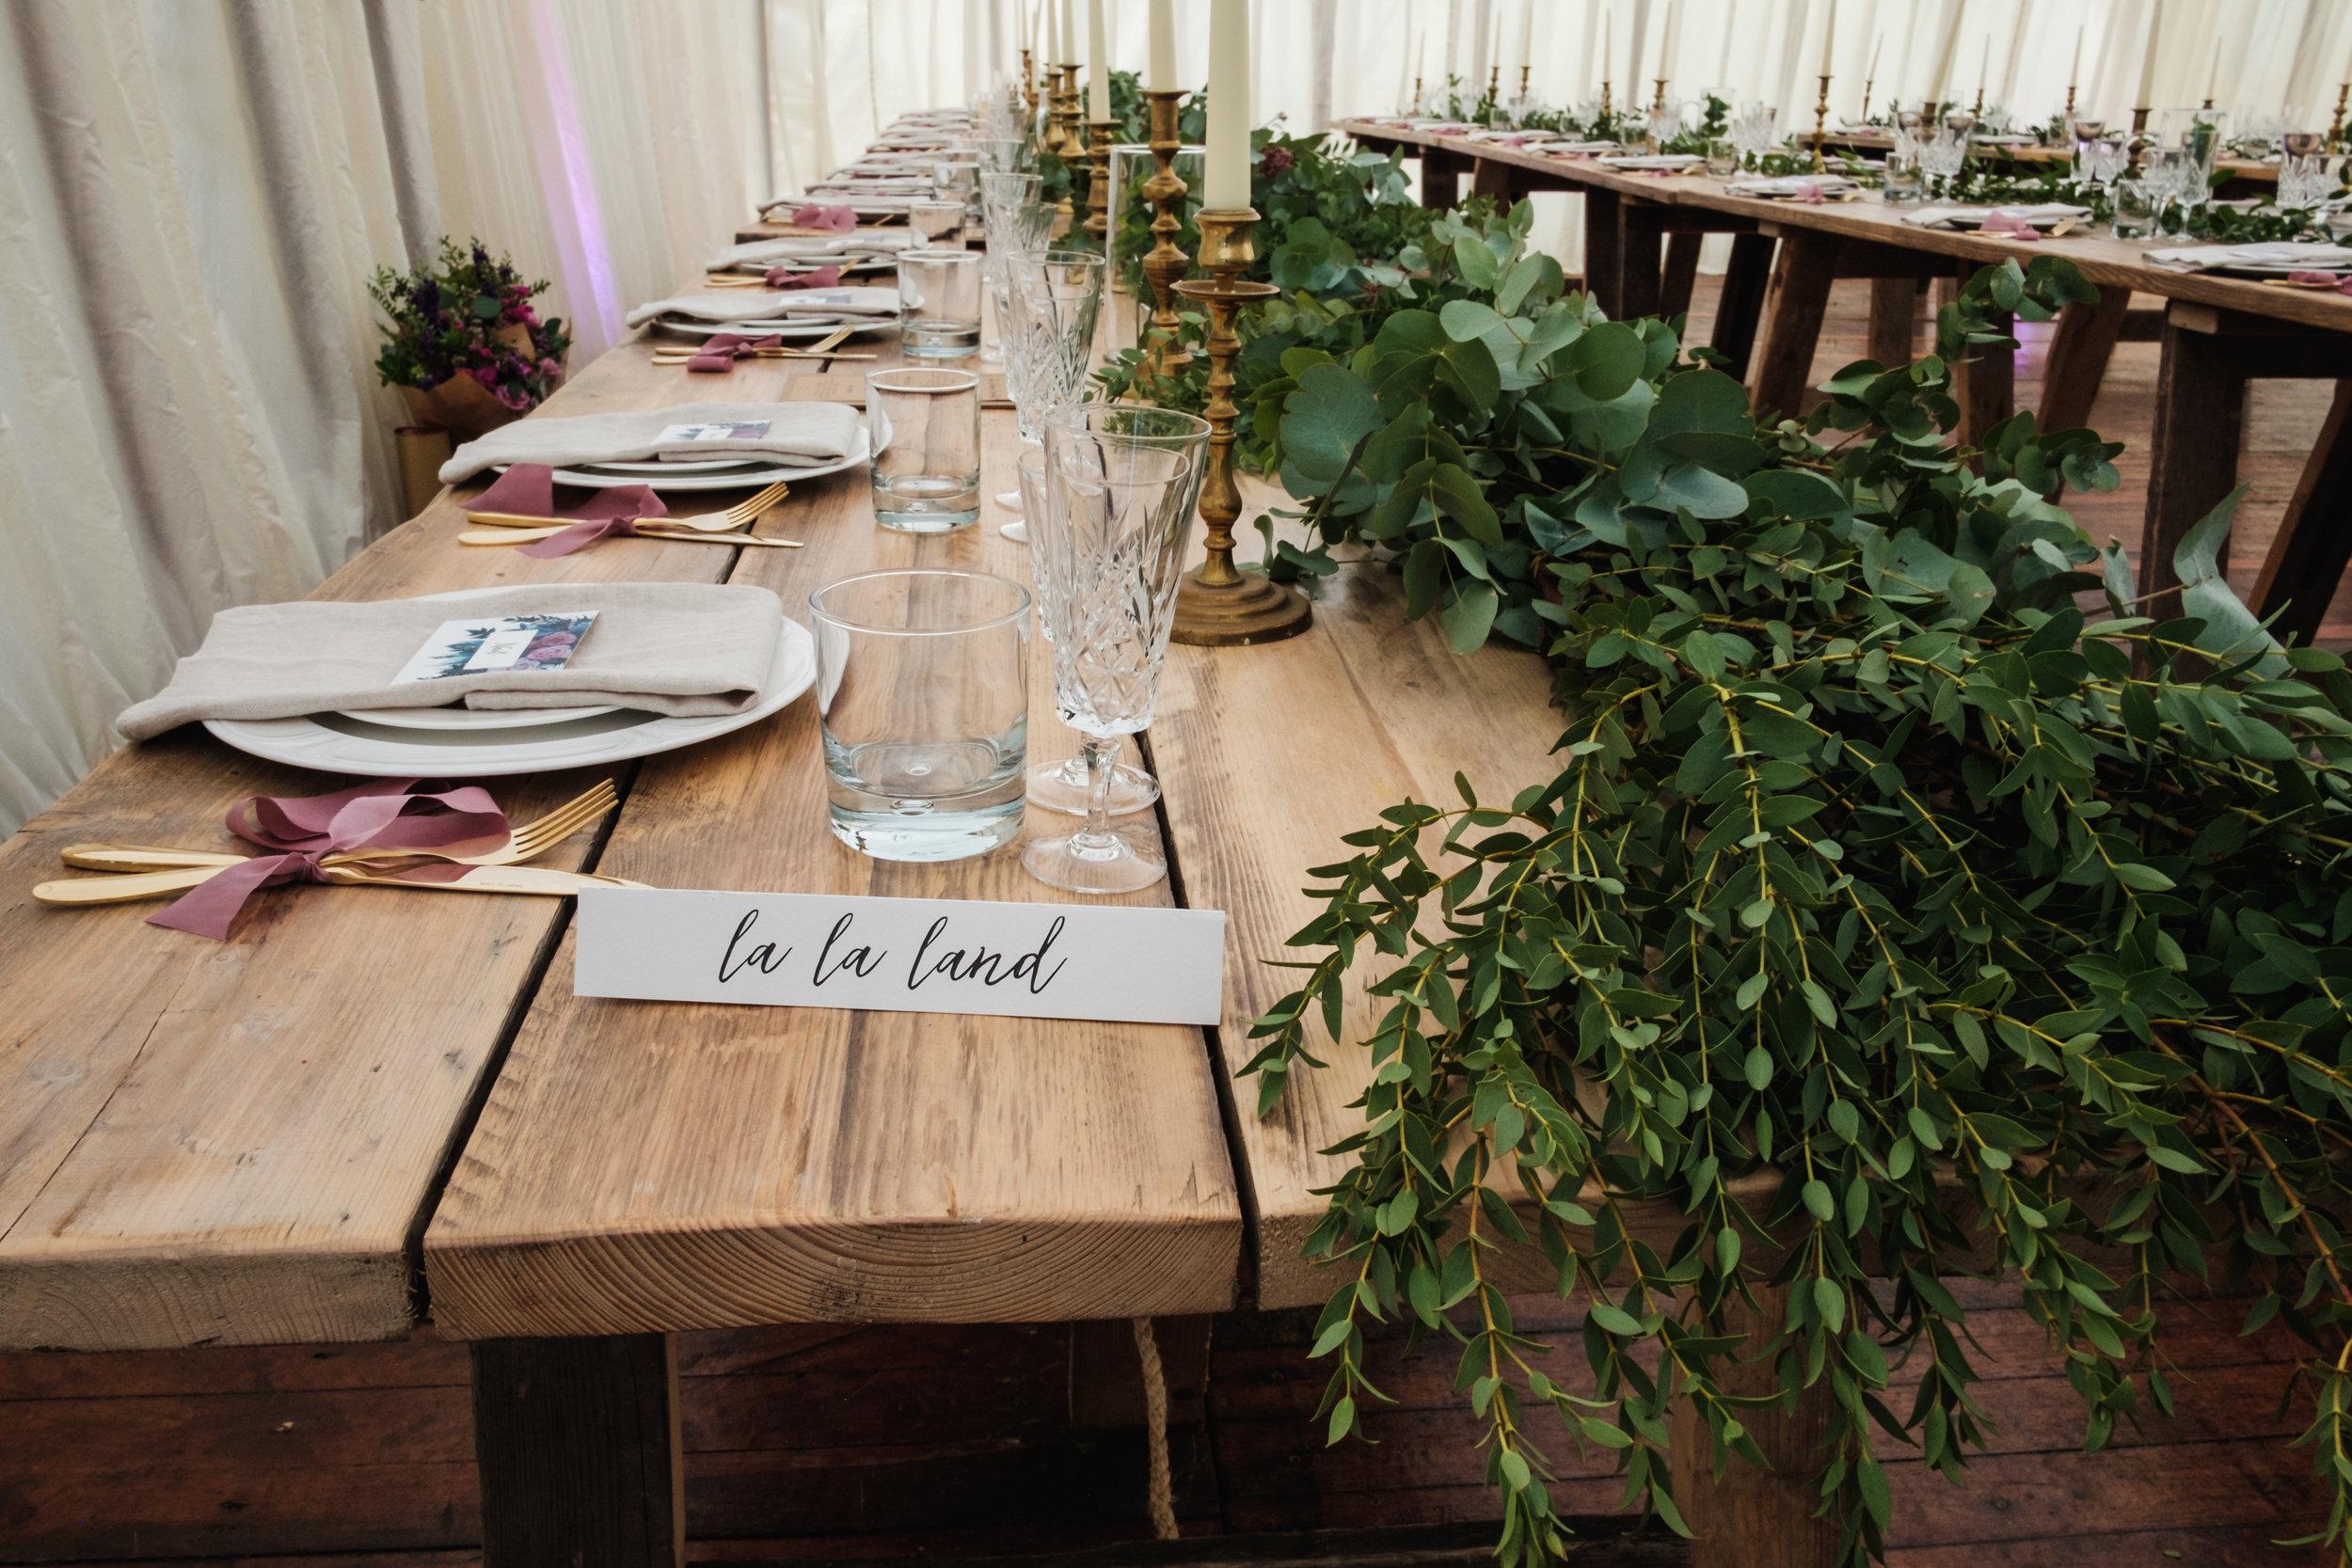 ian and ashley wedding table setting.jpg